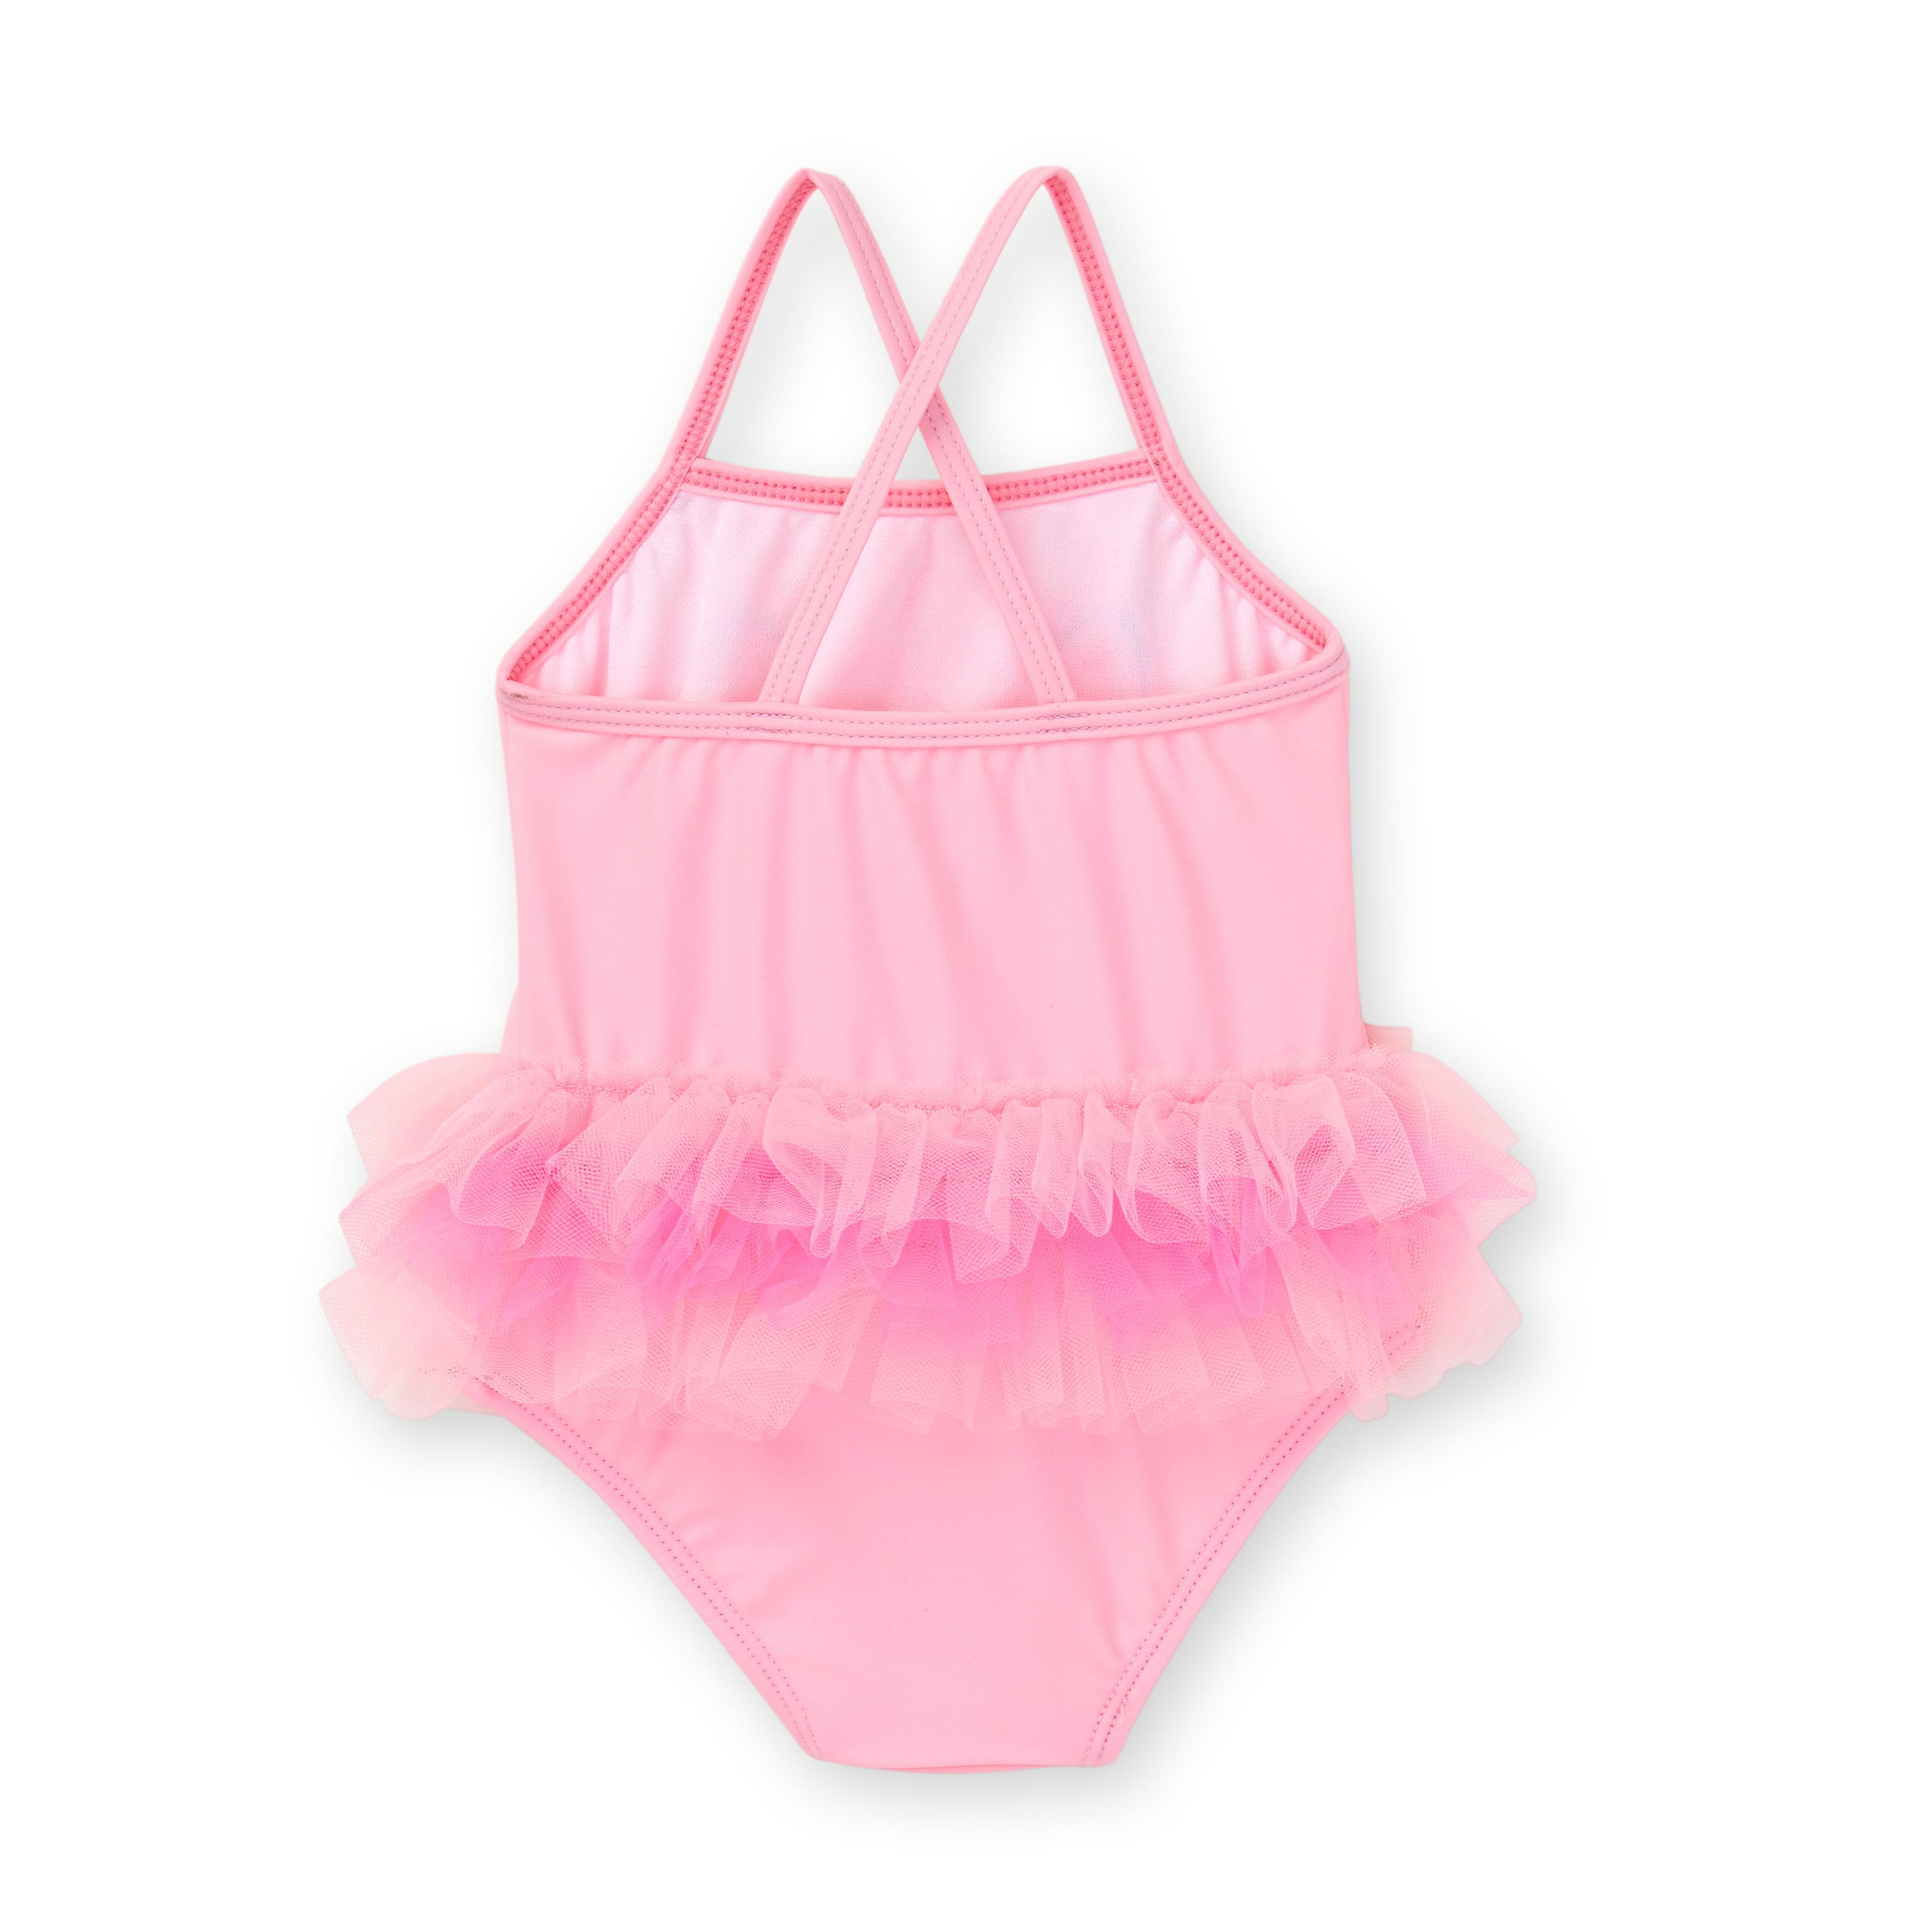 9d32ab4323 Healthtex - Baby Girl Kitty One Piece Tutu Swimwsuit - Walmart.com